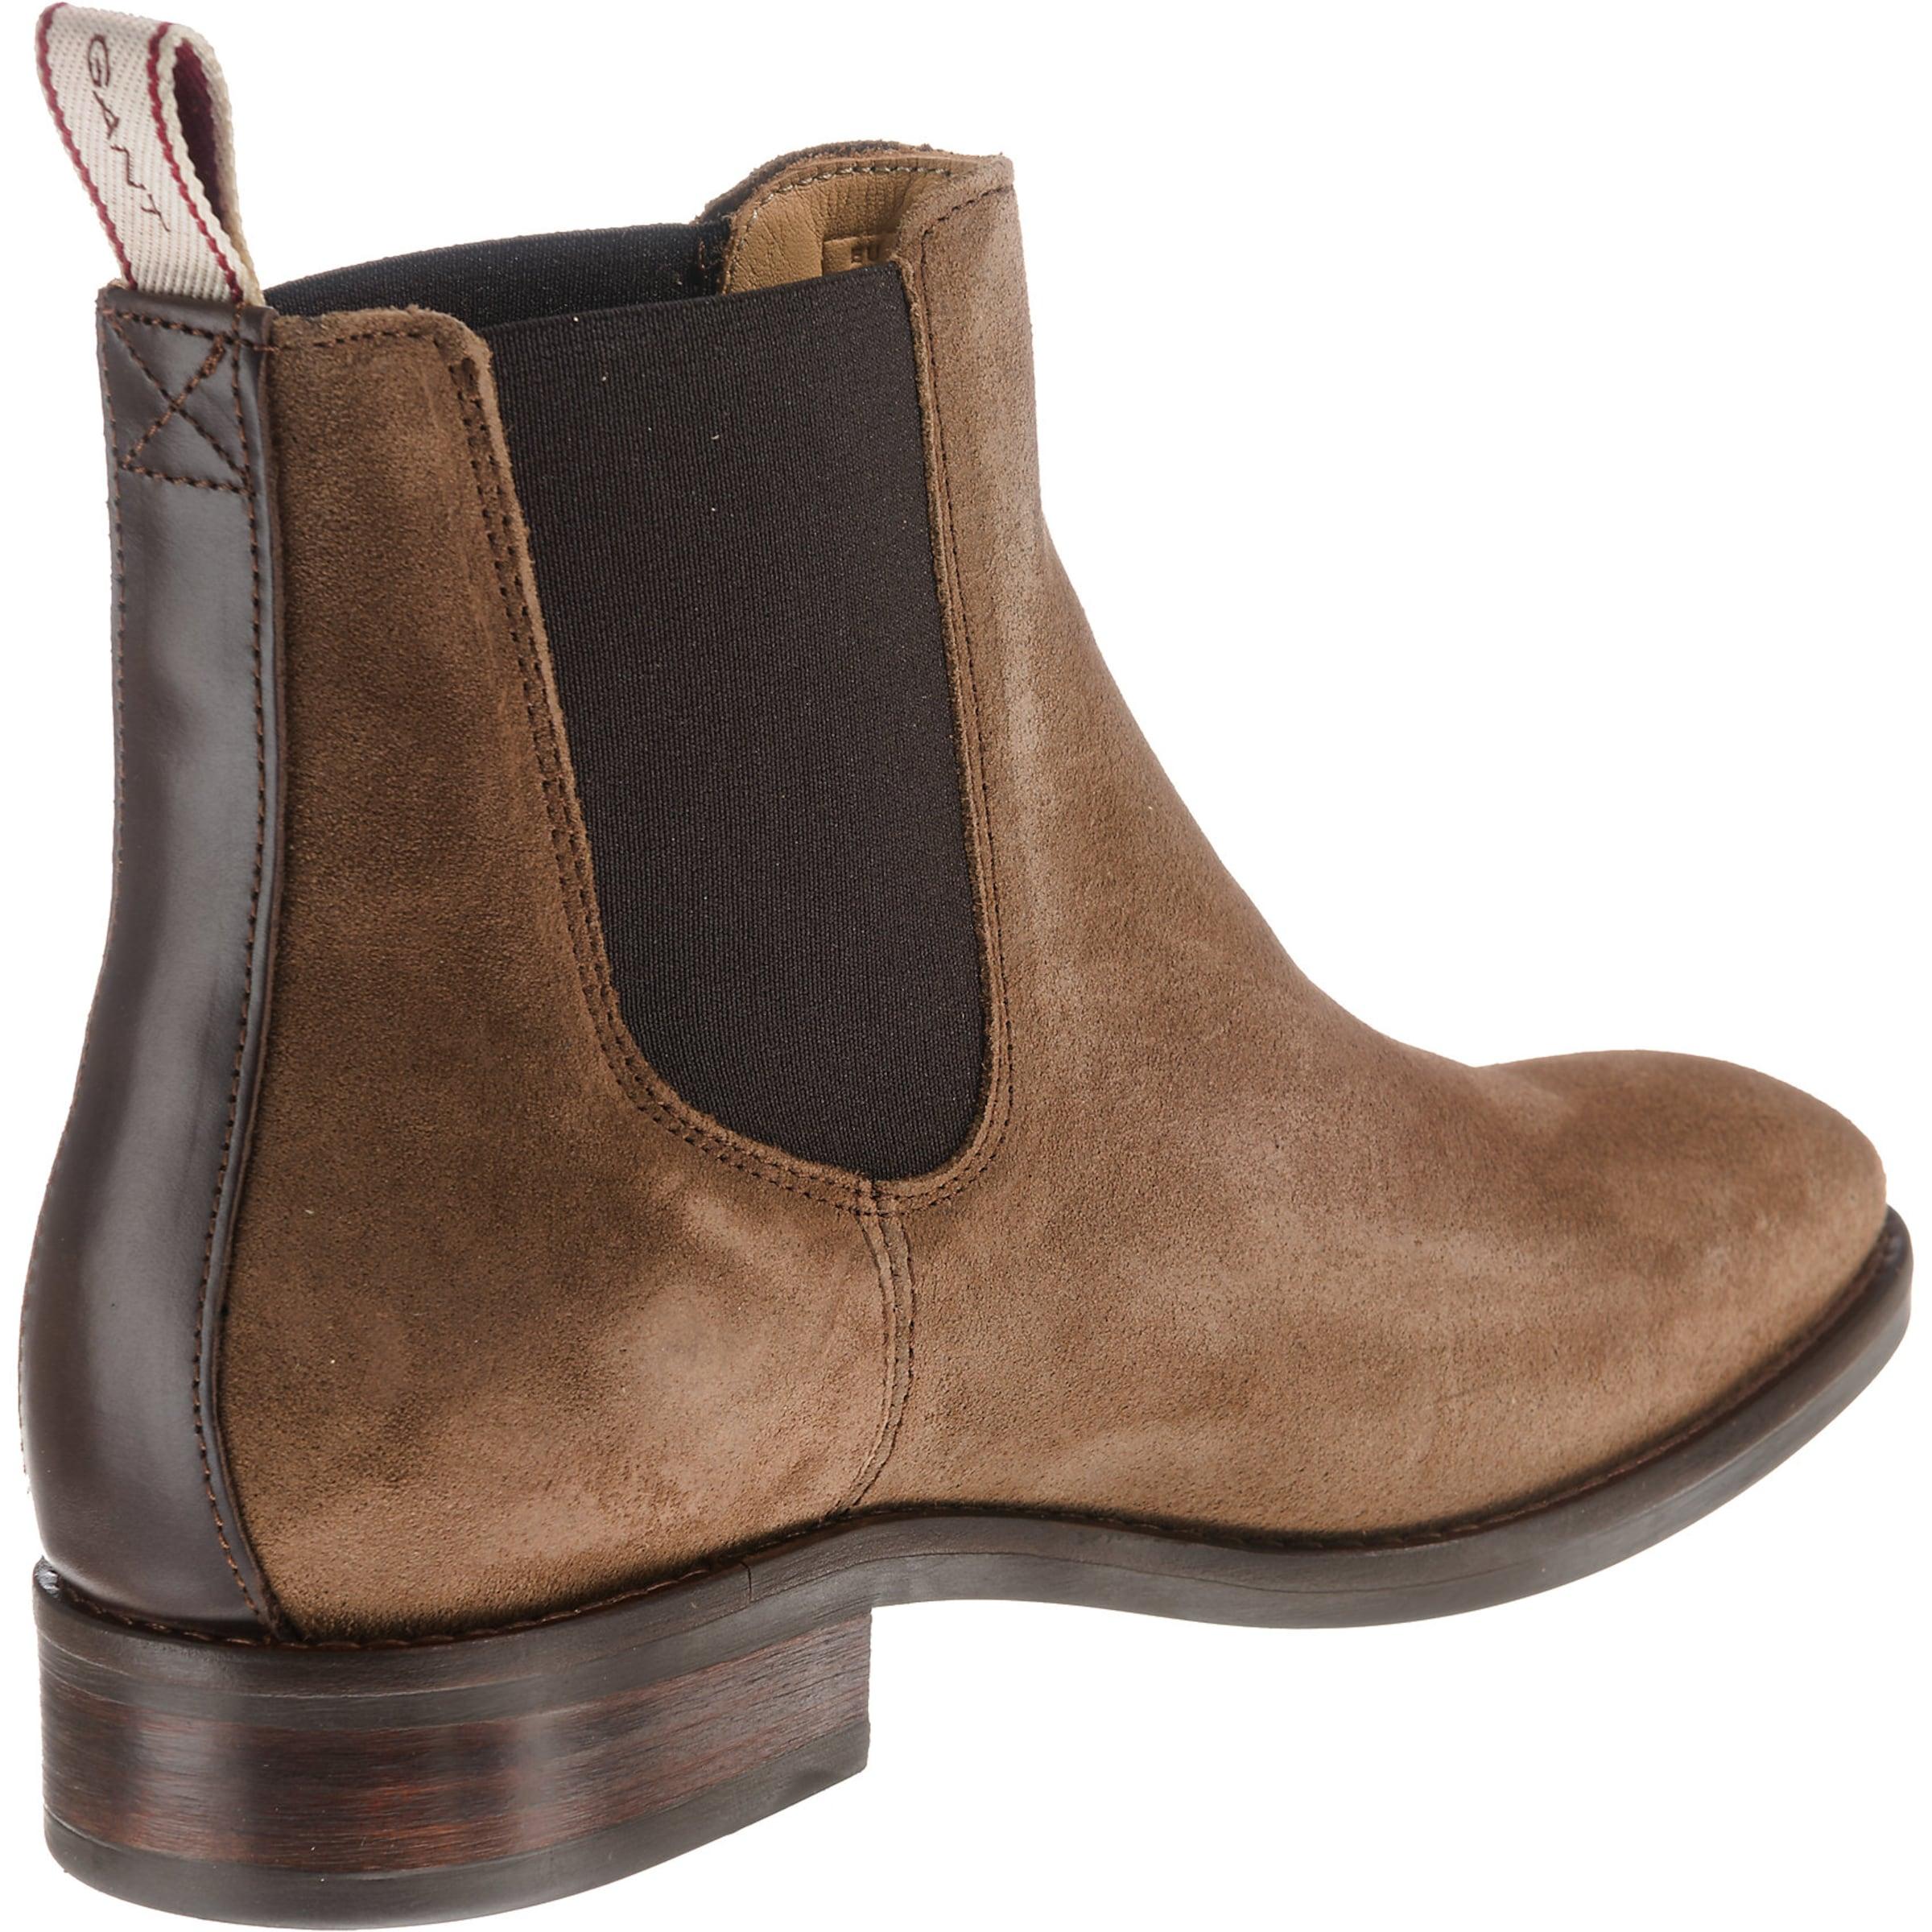 Gant Boots BraunDunkelbraun In Chelsea 'fay ' 76vmfyIgYb